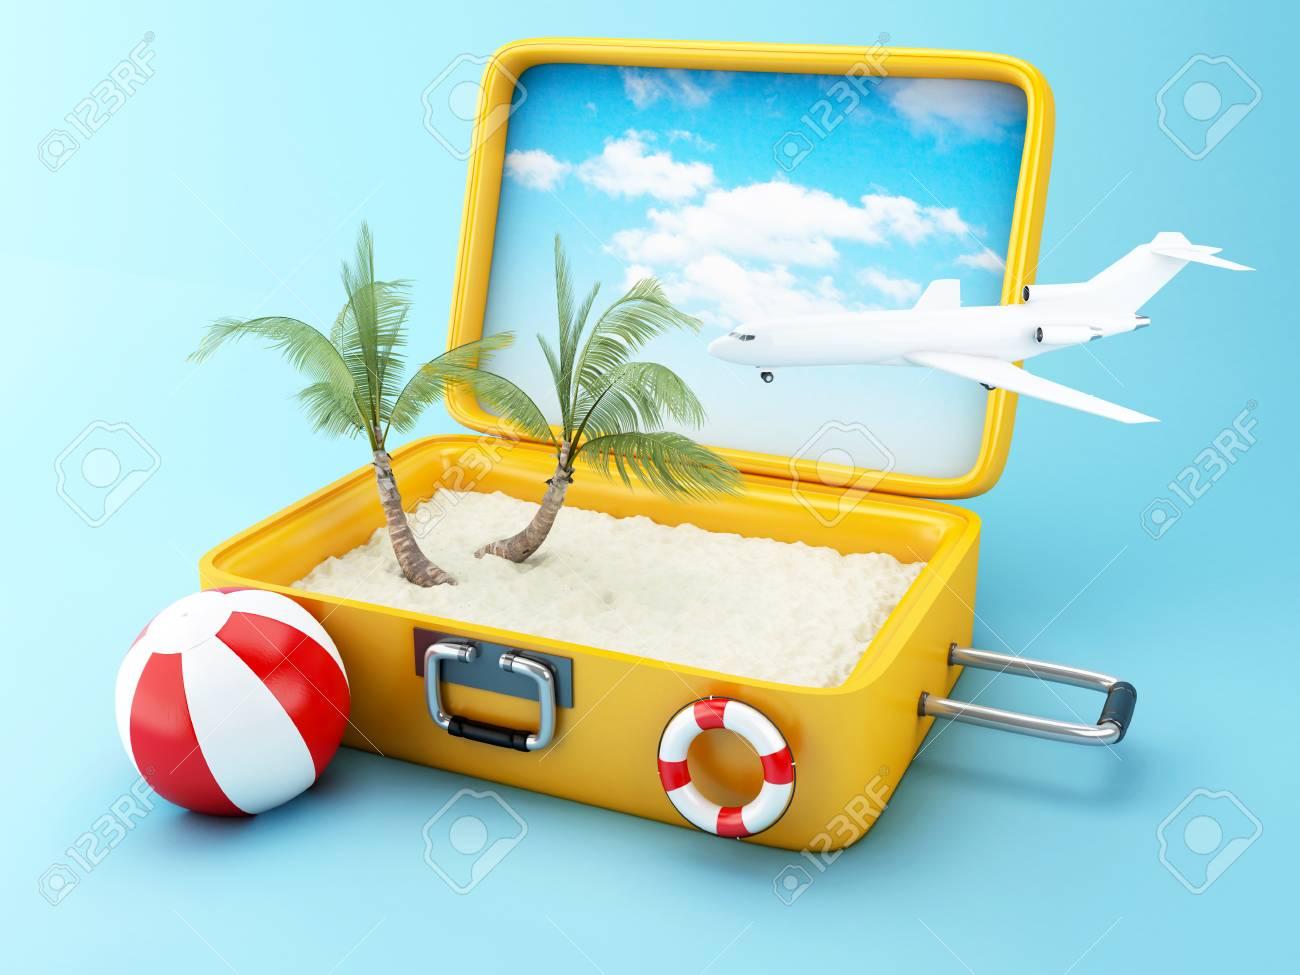 paradise beach game free full version